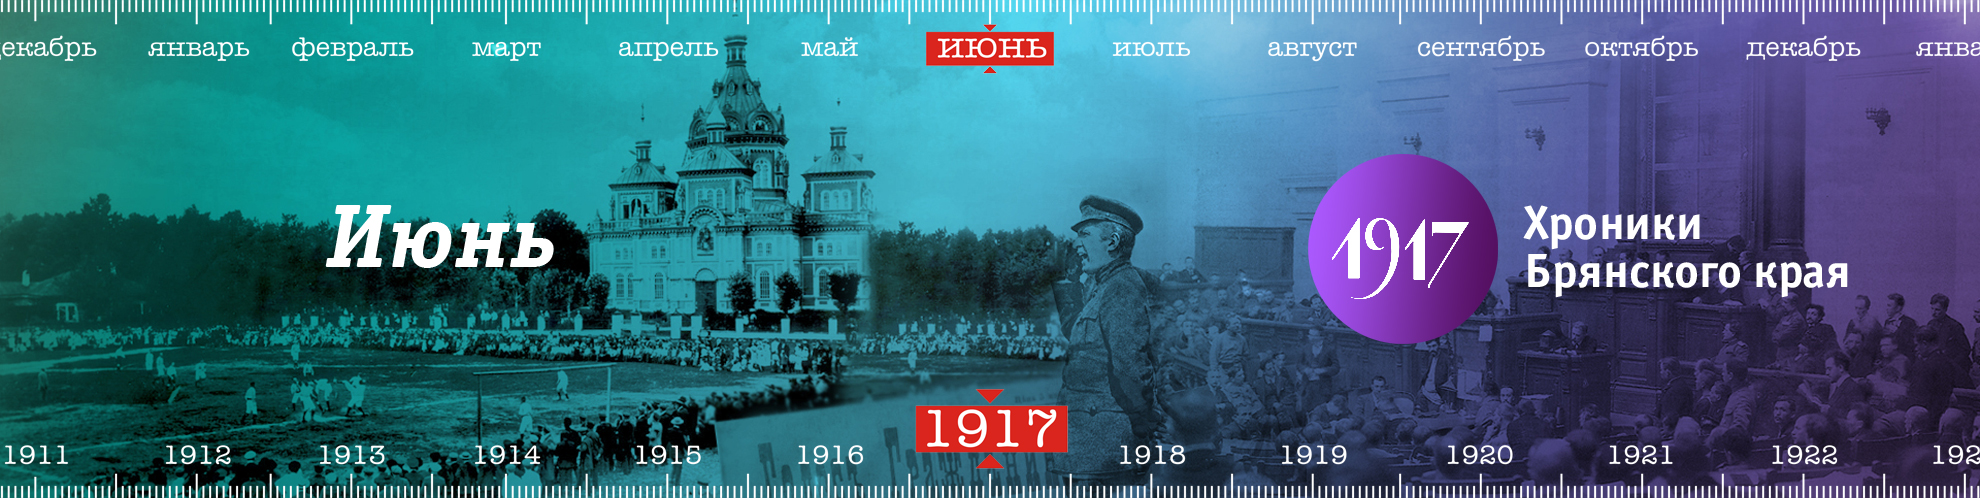 1917. Хроники Брянского края - Июнь